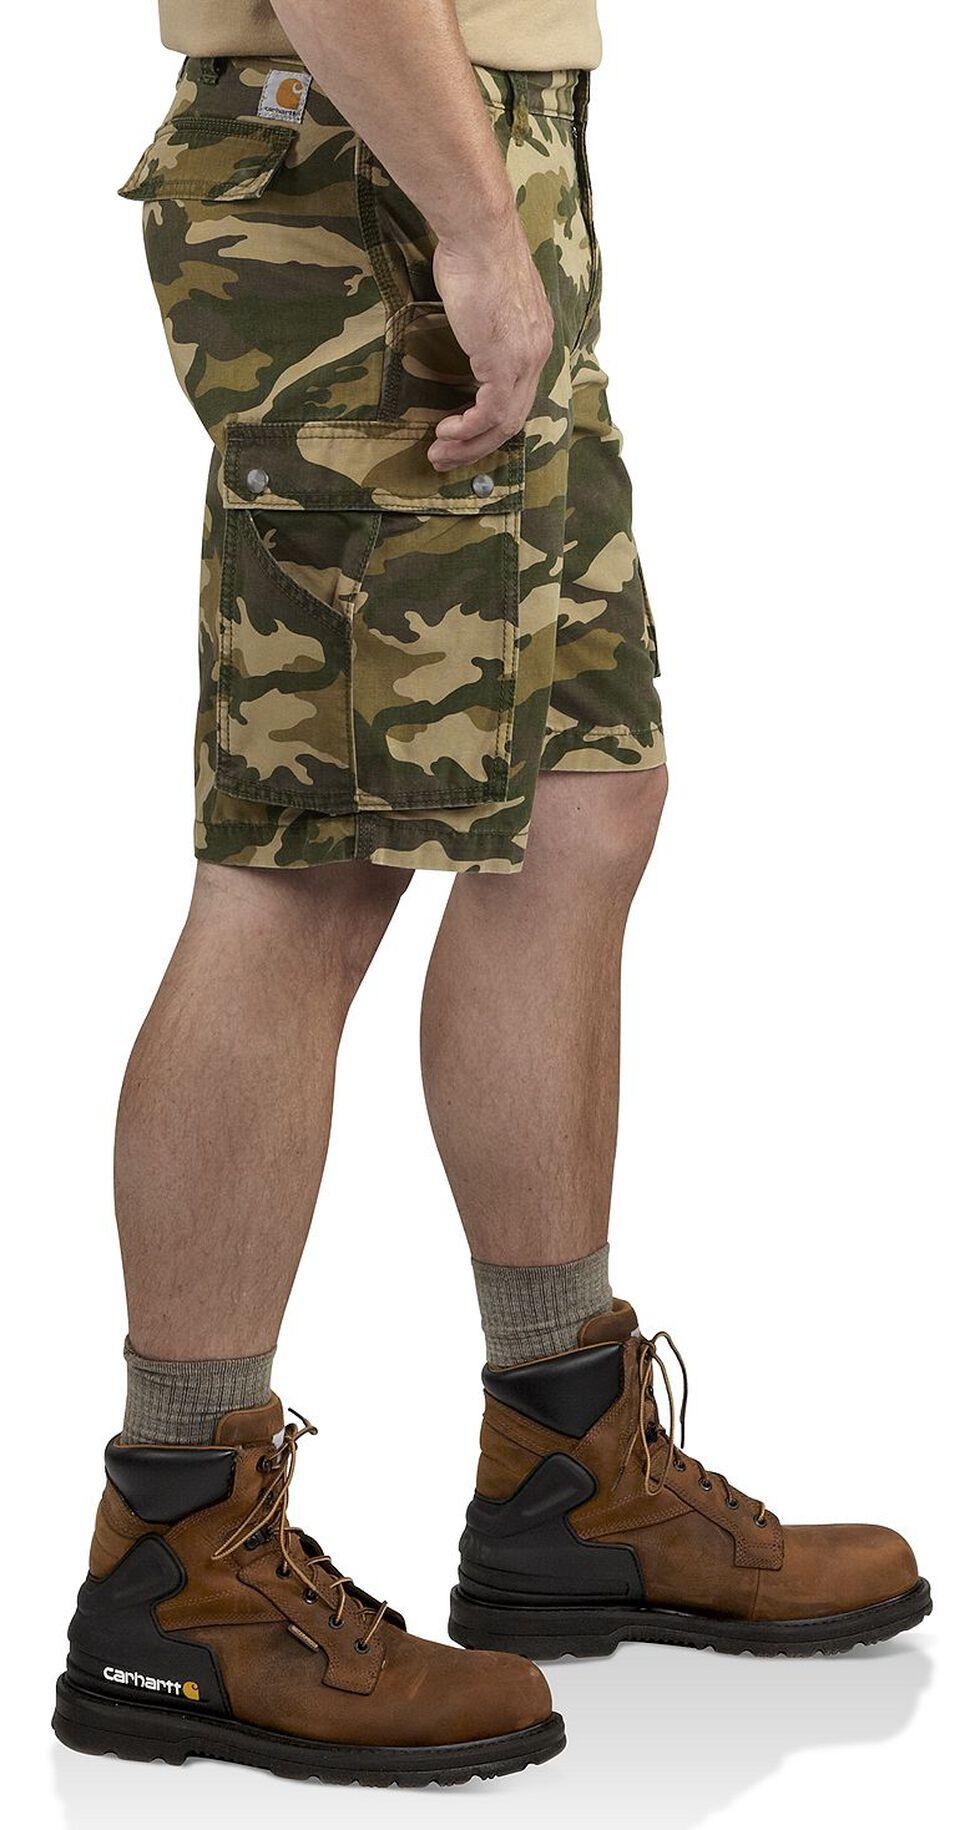 Carhartt Rugged Cargo Camo Shorts, Khaki Camo, hi-res